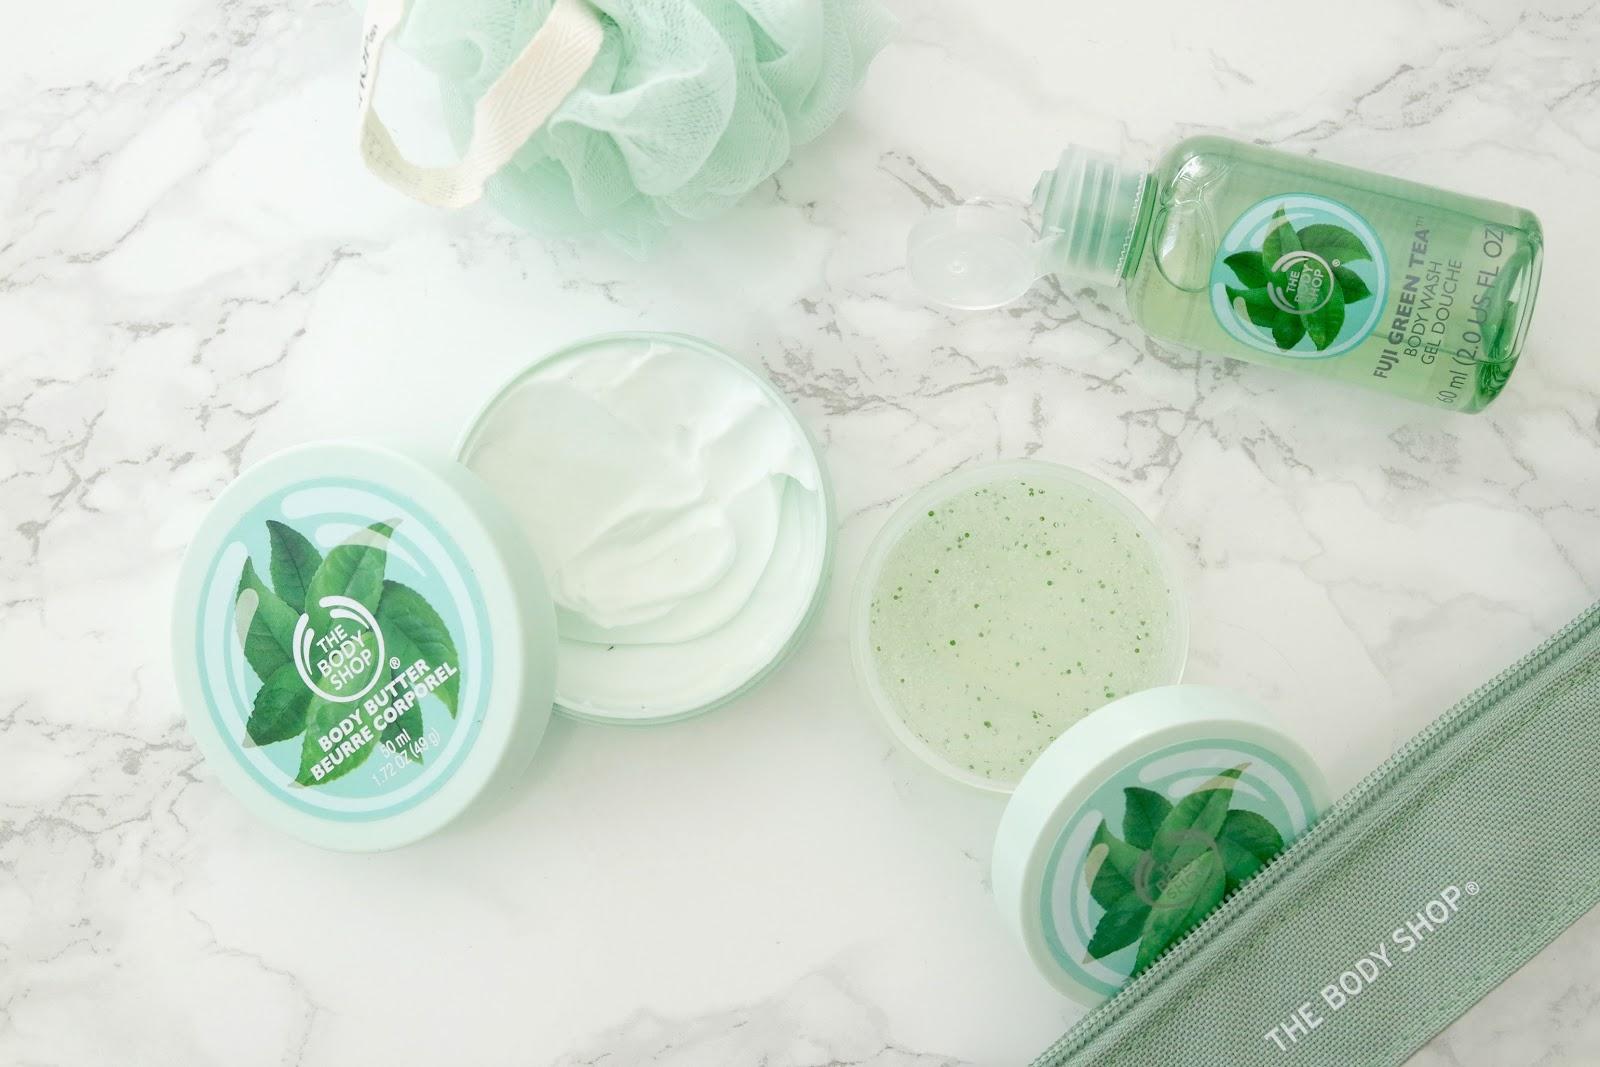 thebodyshop-fji-green-tea-body-butter-deponline